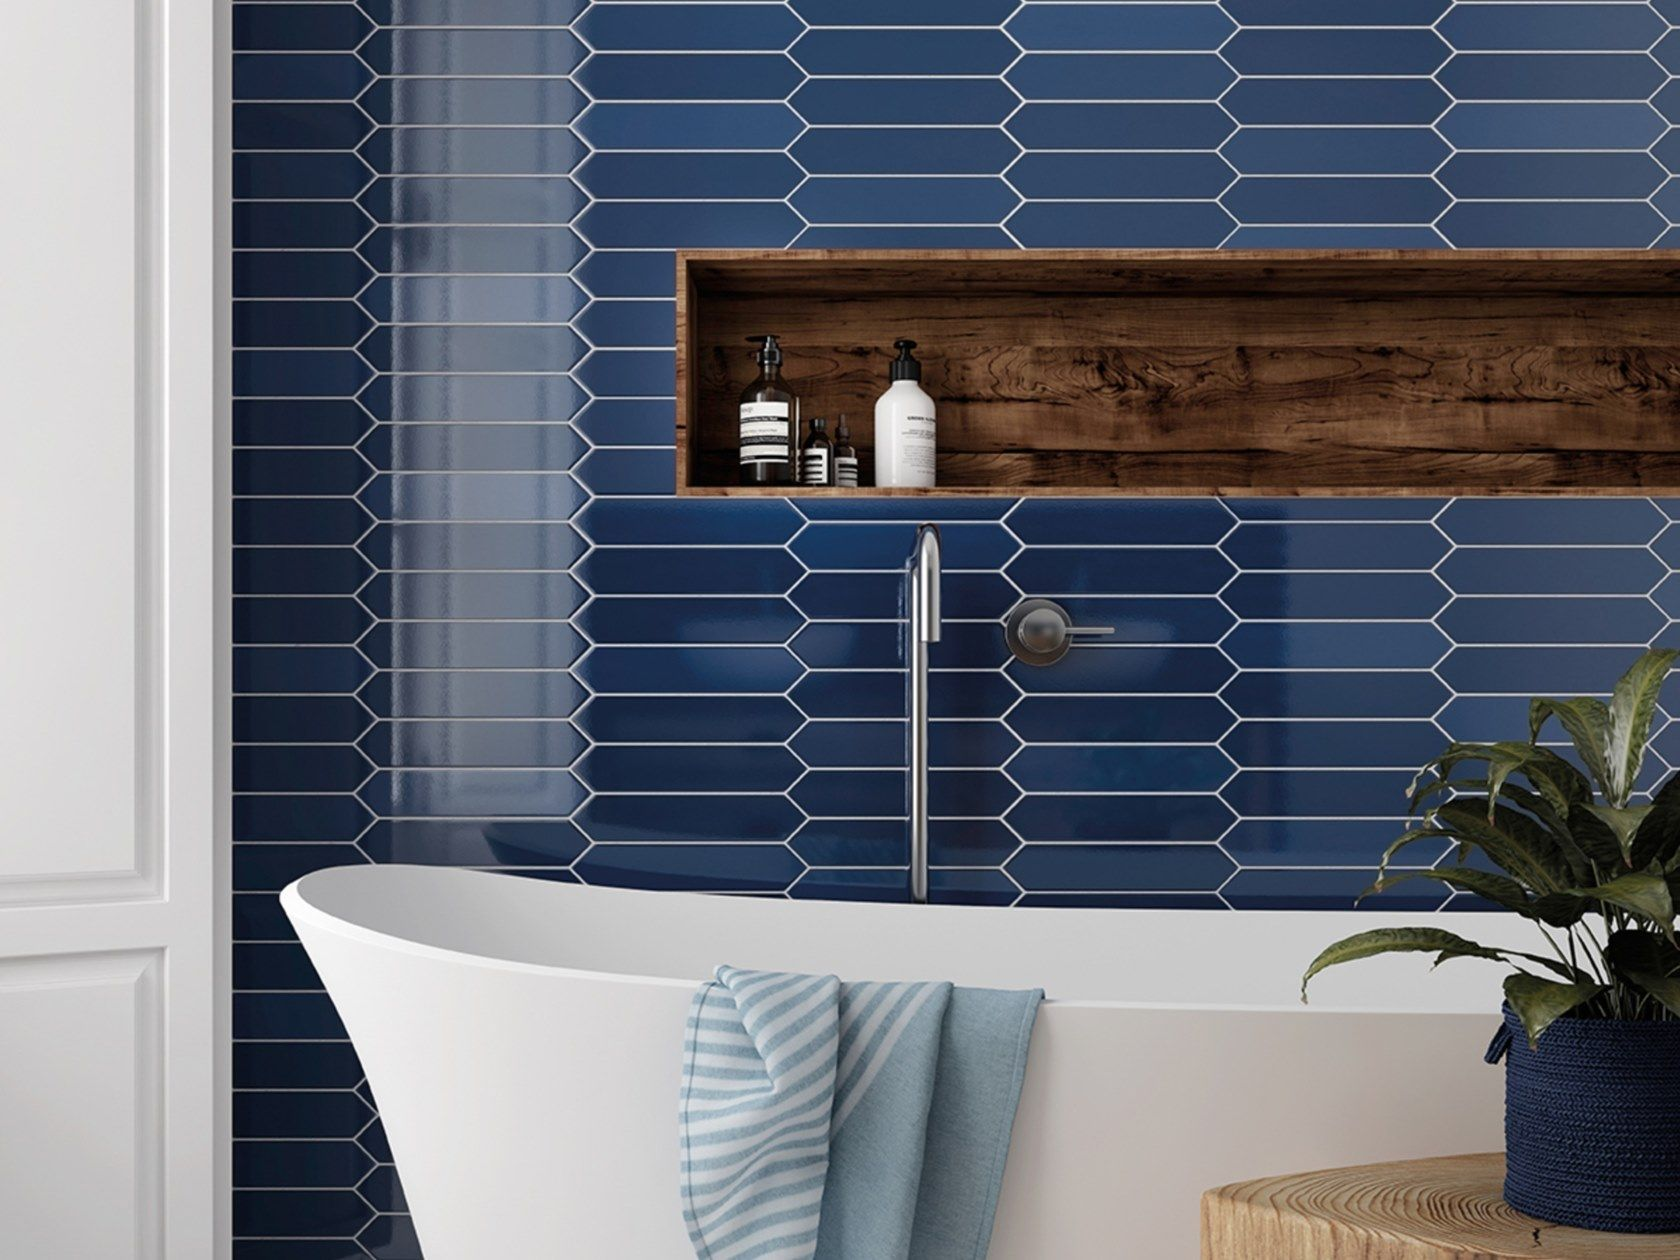 White Paste Wall Tiles Arrow By Equipe Ceramicas Blue Bathroom Tile Blue Tile Wall Dark Blue Walls